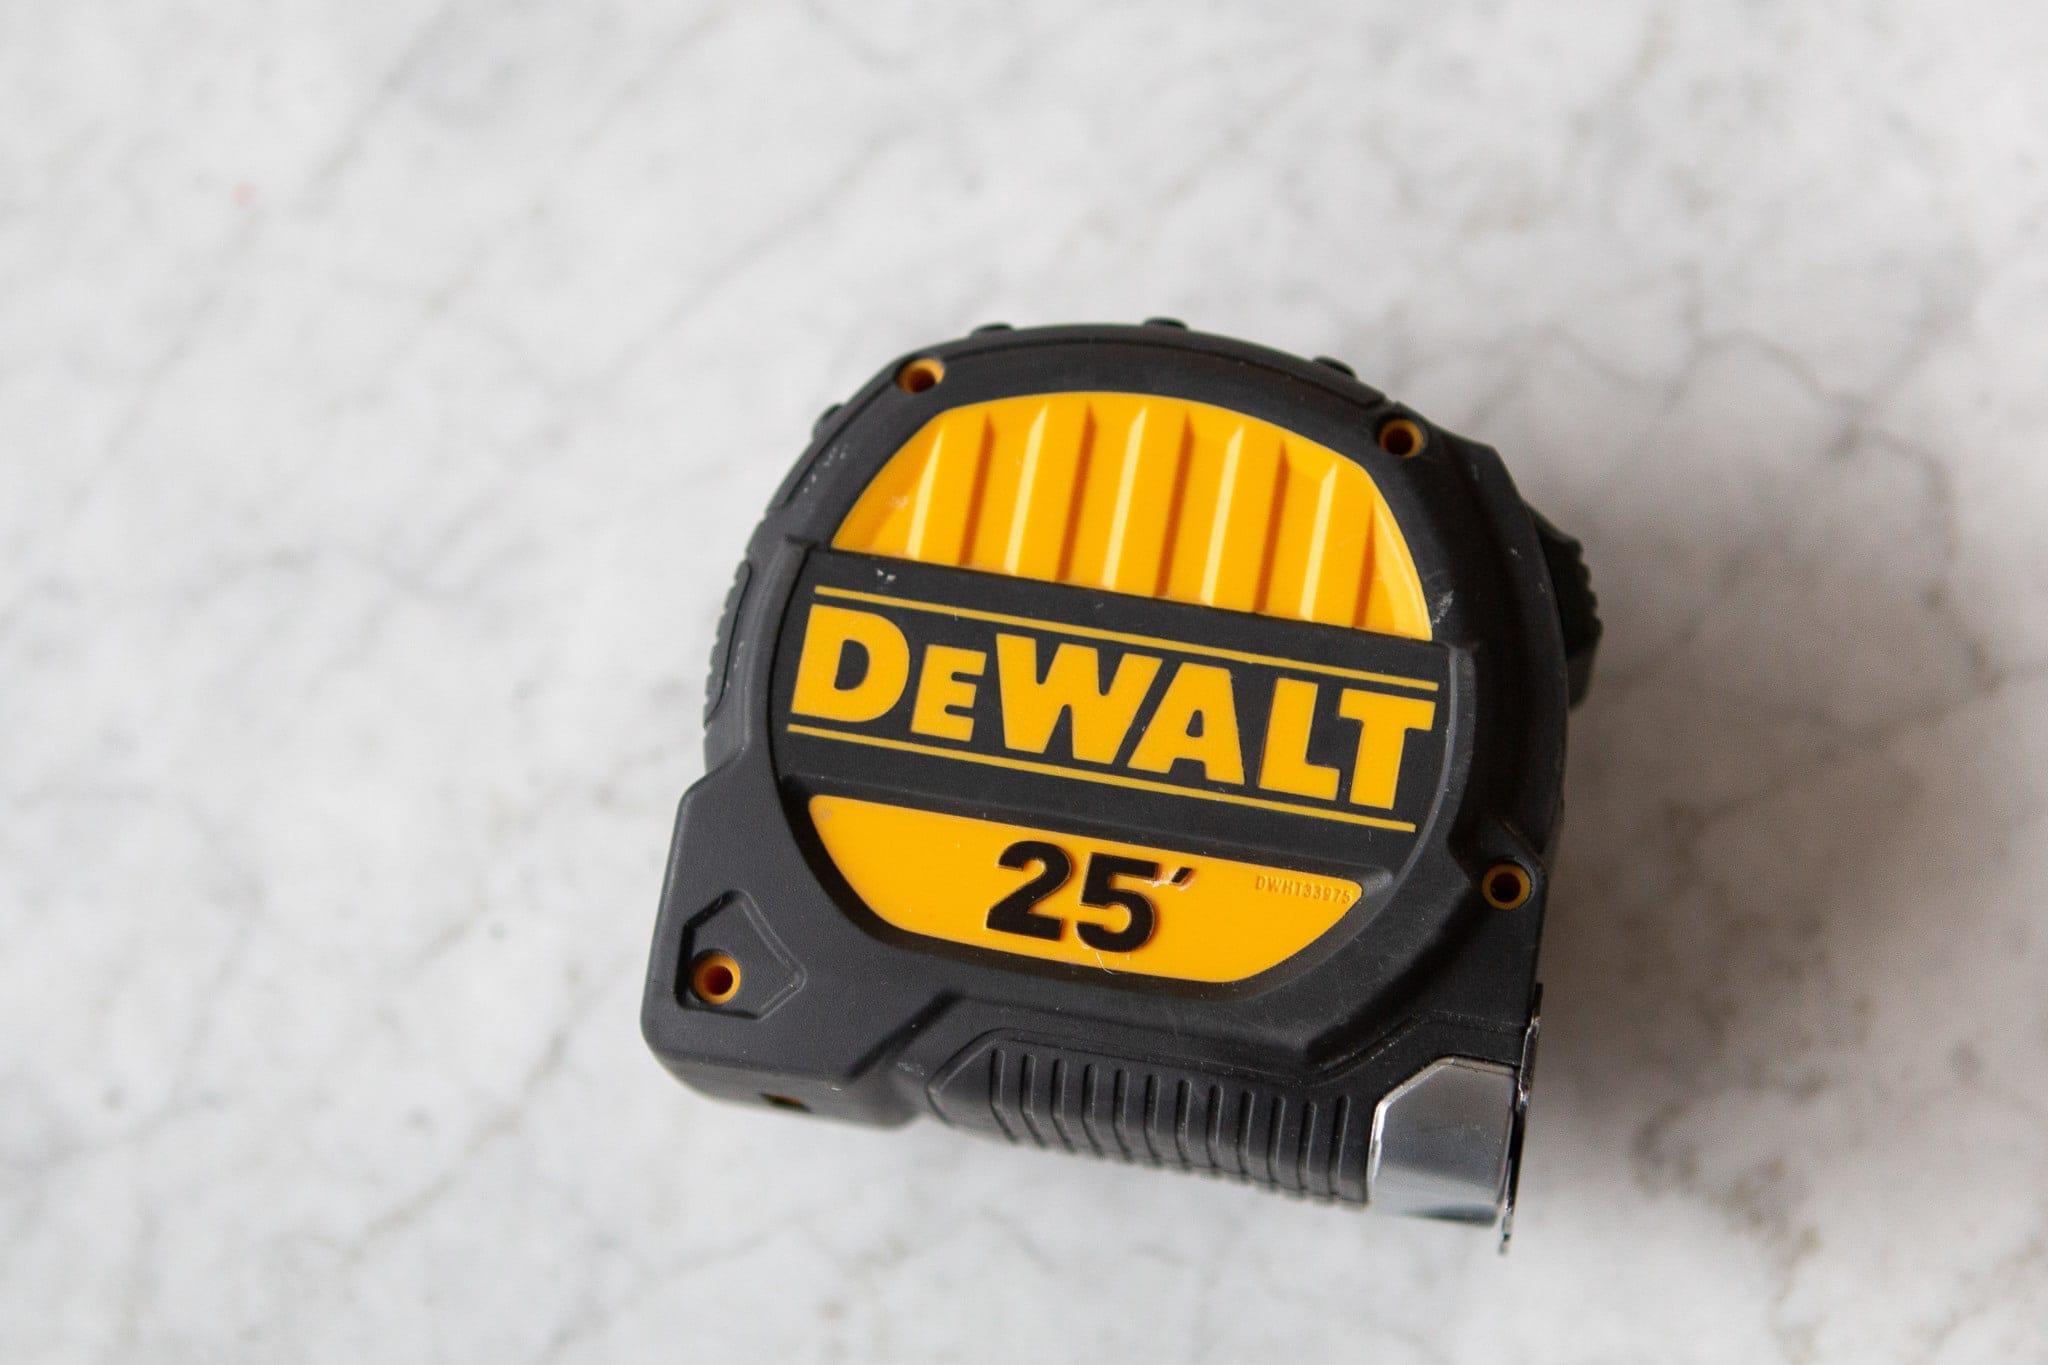 Dewalt 25' tape measure